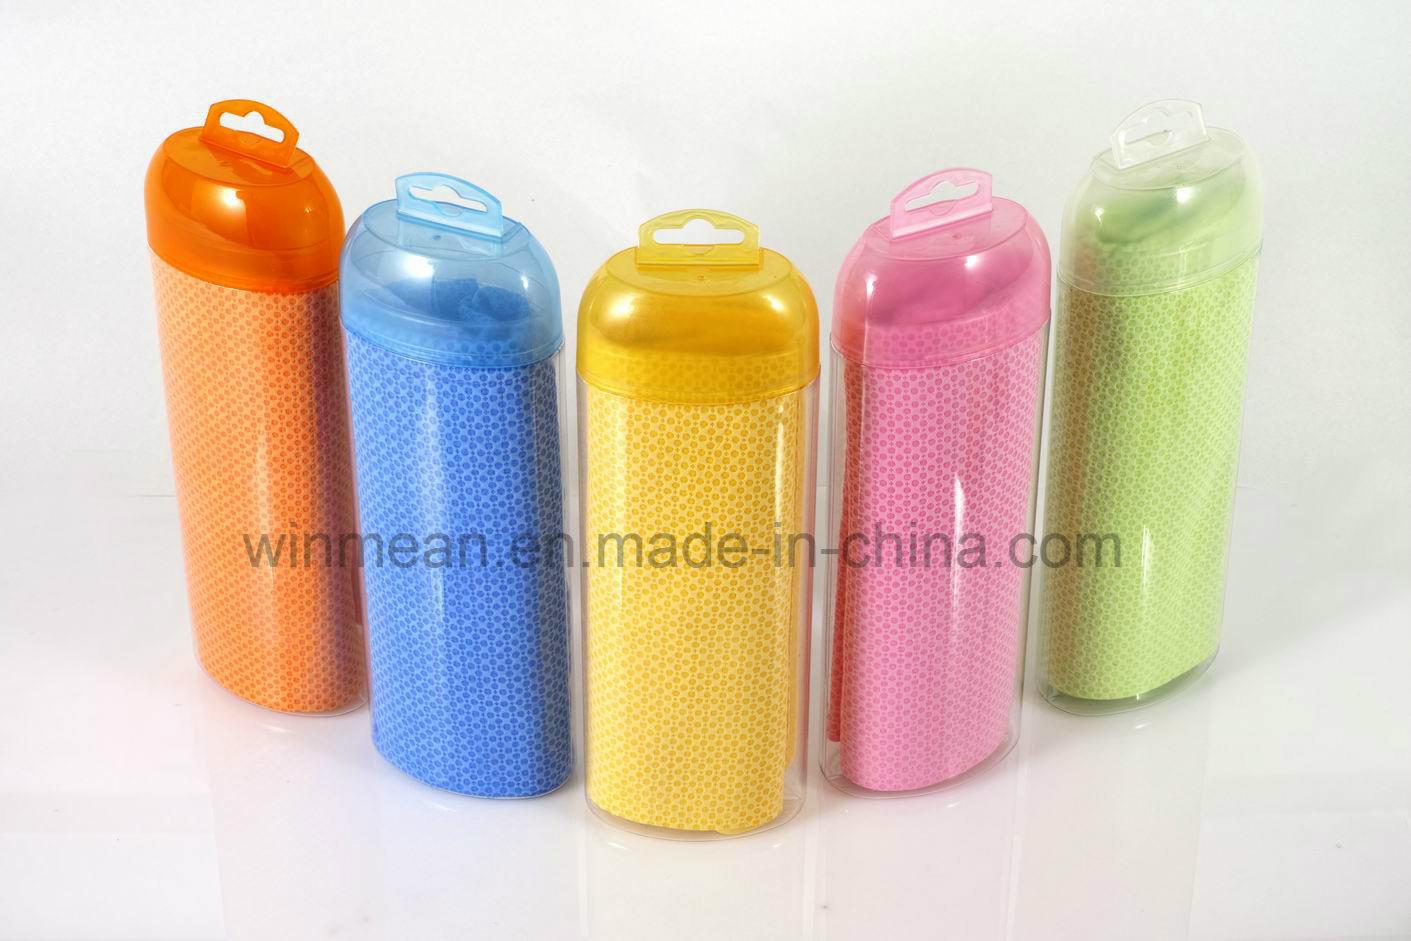 PVA Cooling Towel Towel Manufacturer